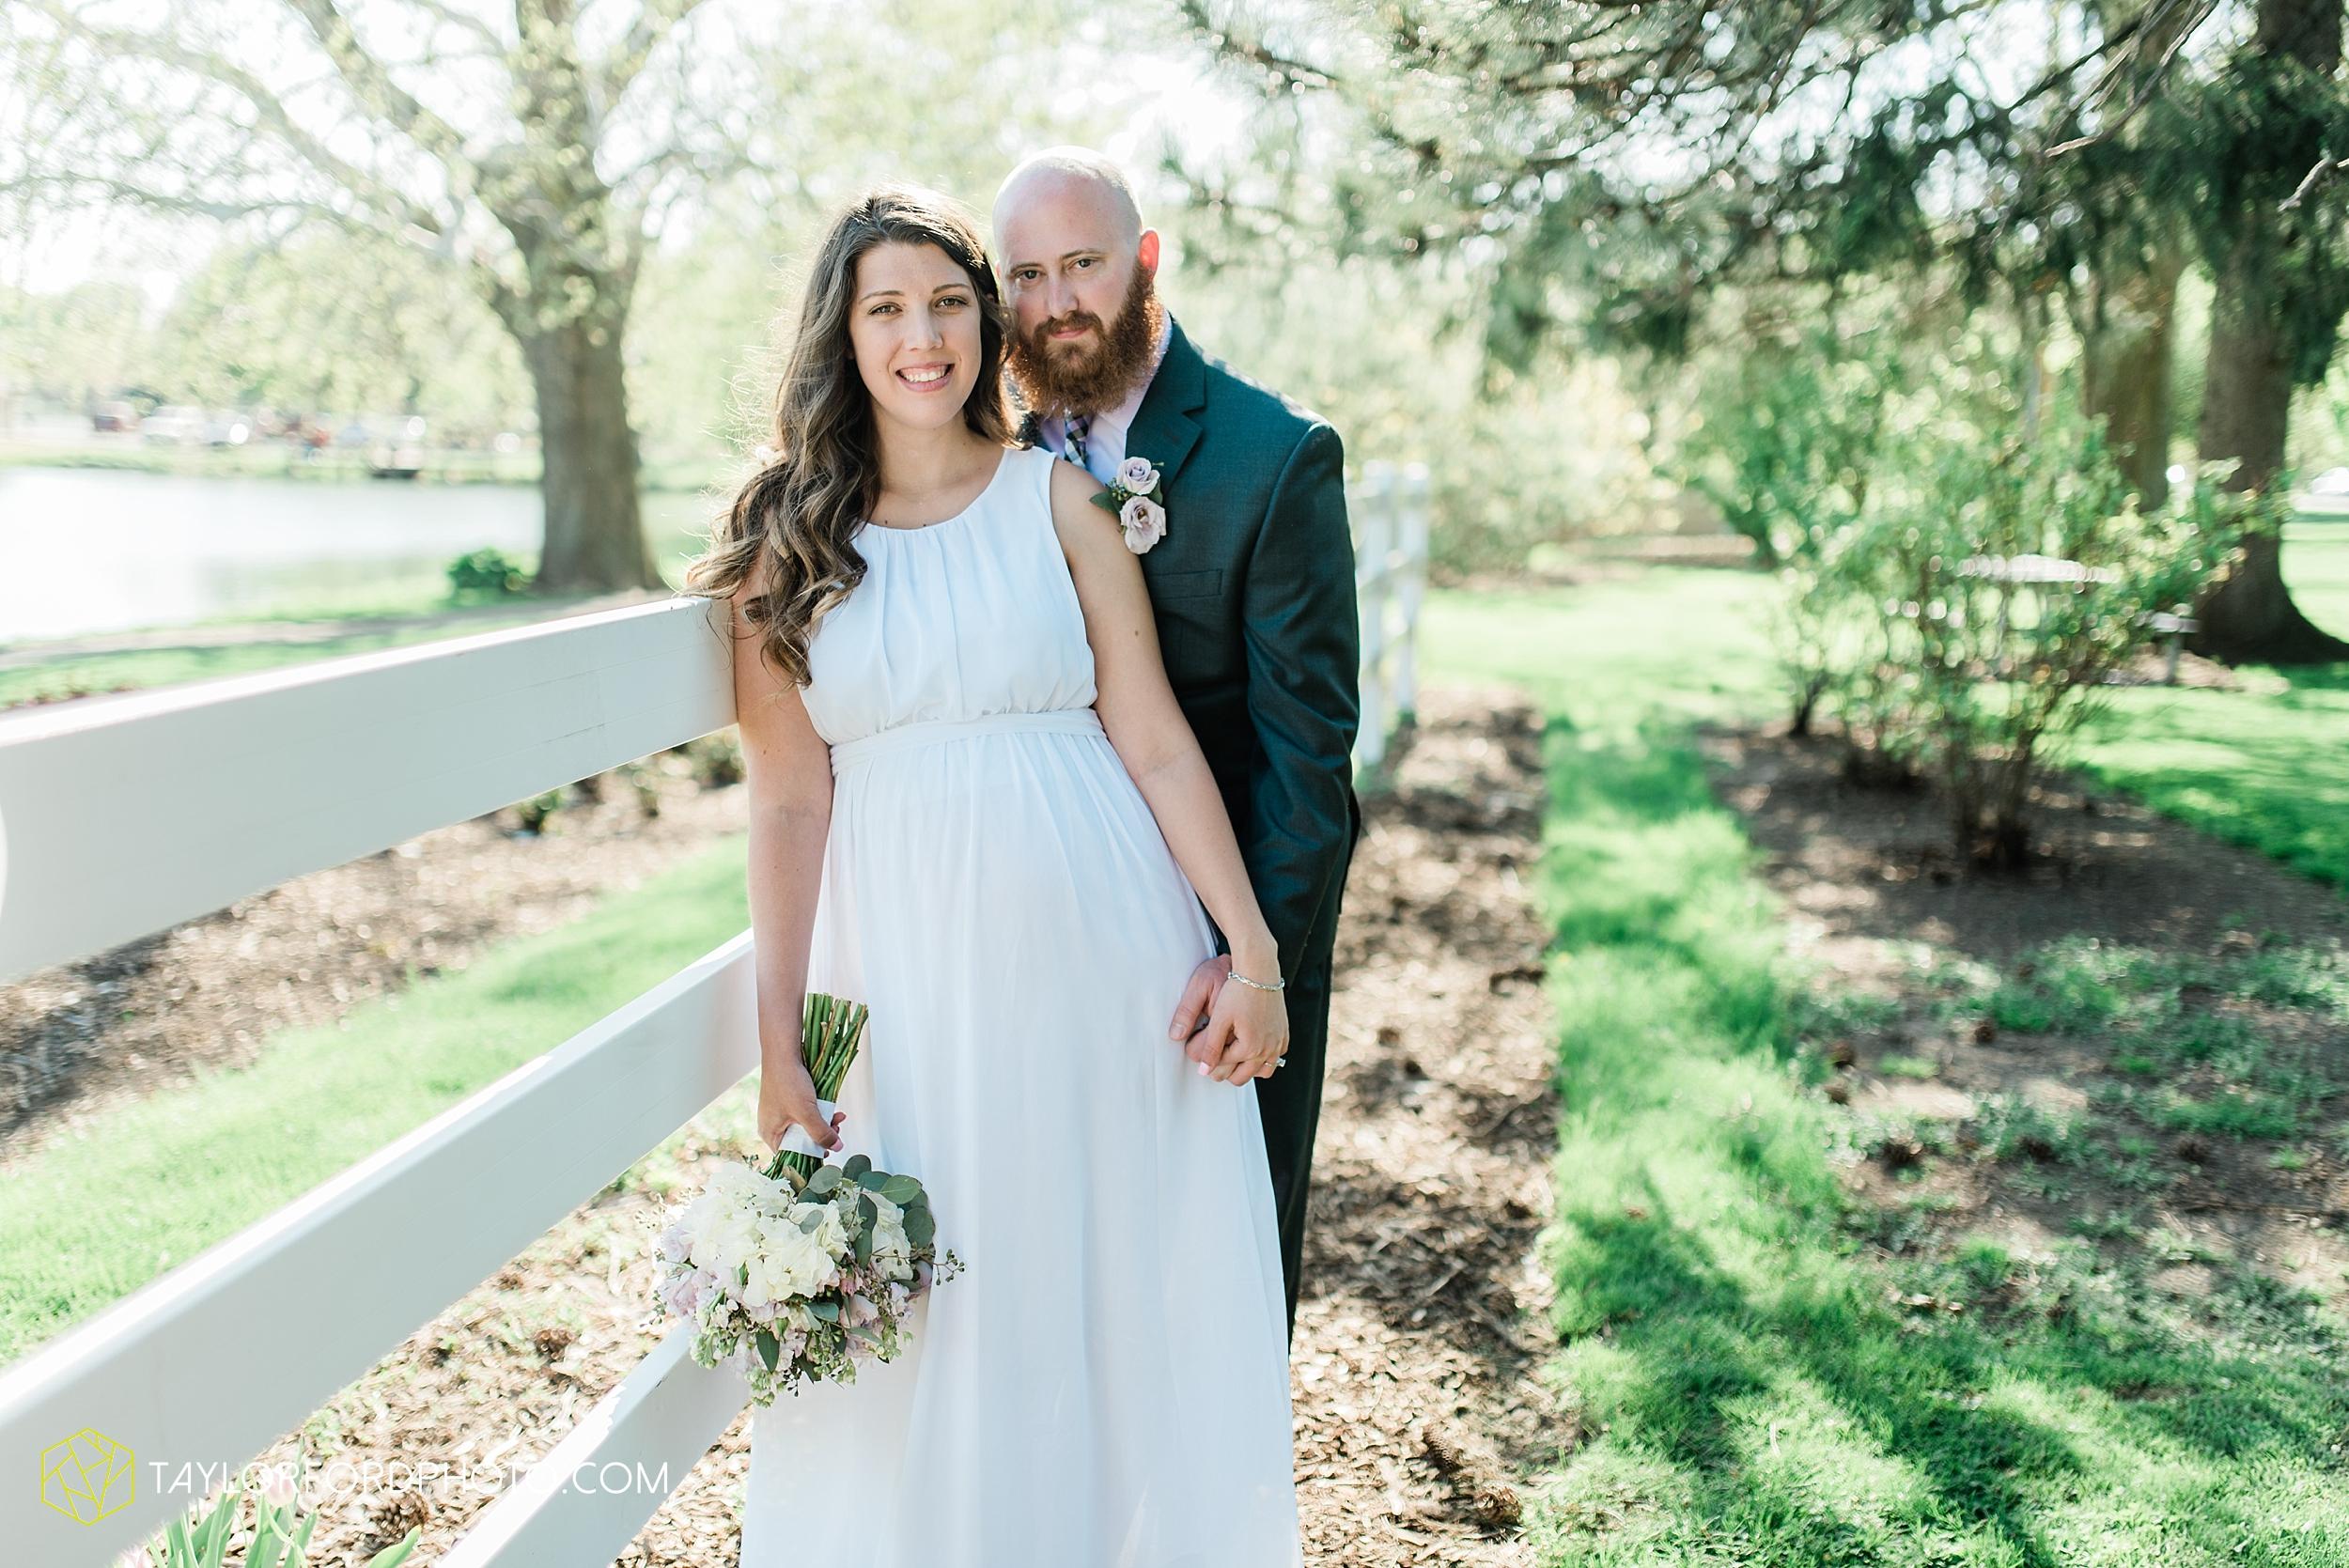 lakeside-rose-gardens-fort-wayne-indiana-elopement-wedding-photographer-Taylor-Ford-Photography_7185.jpg